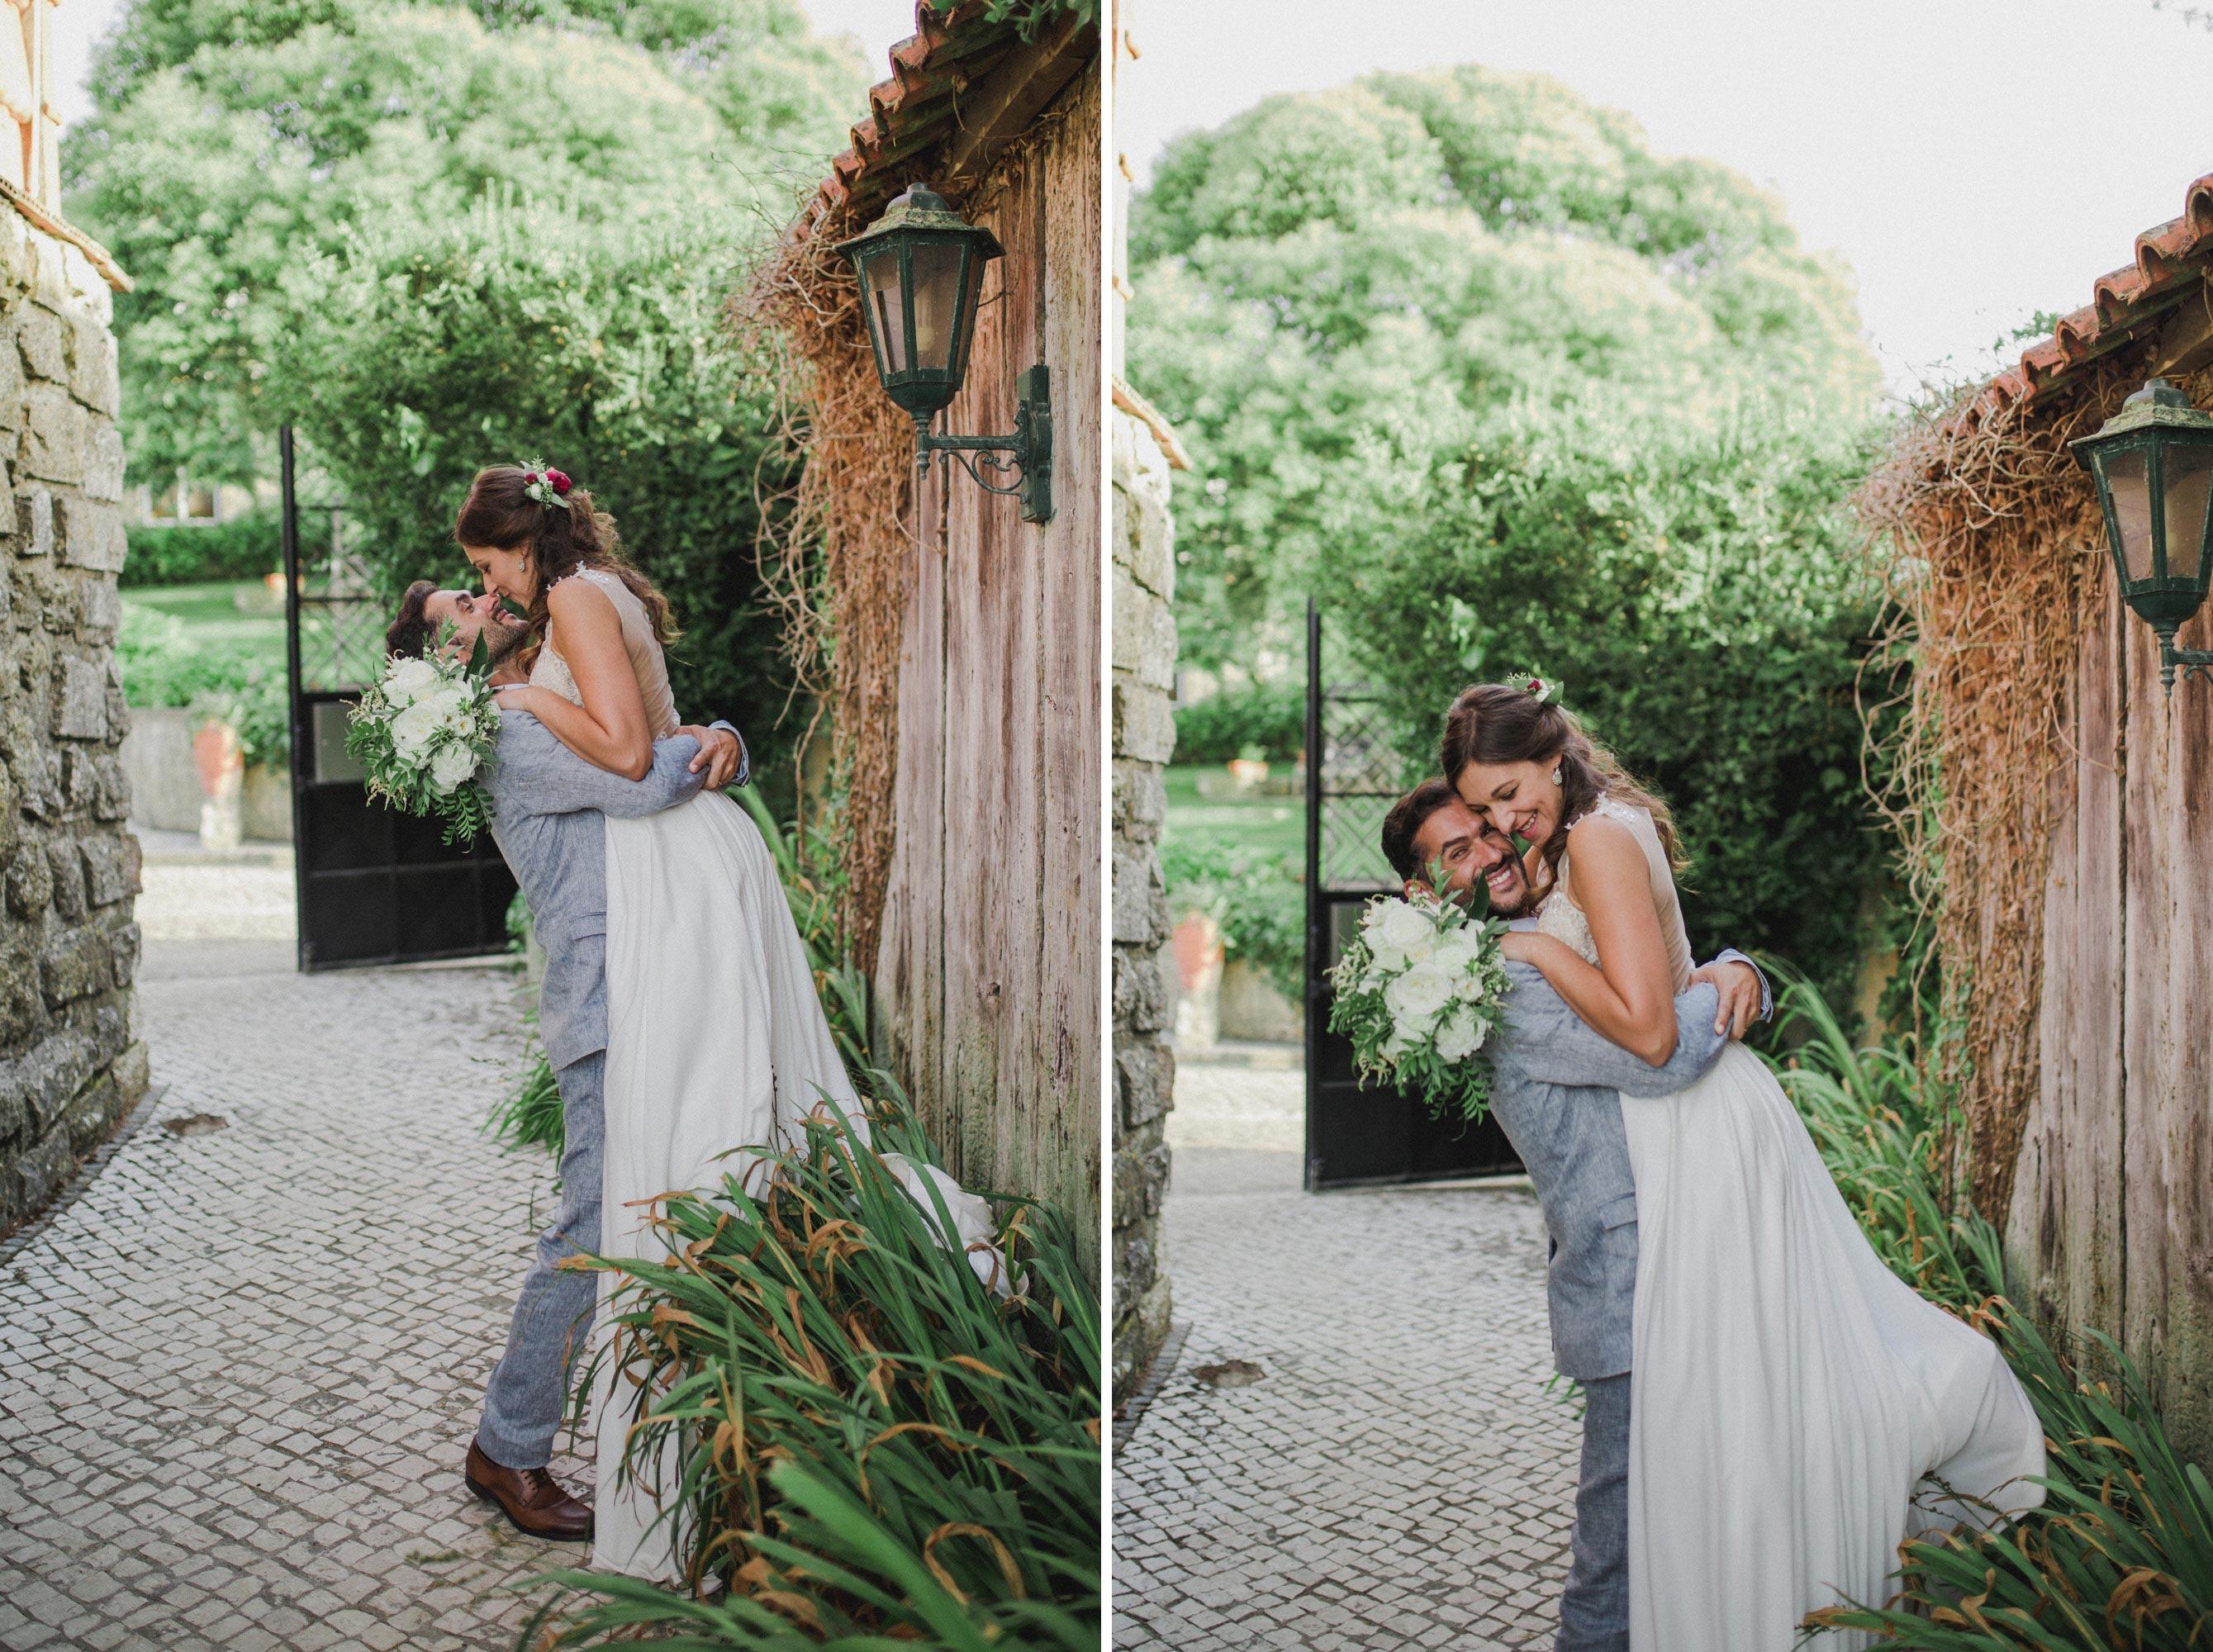 021-carina-e-samuel-wedding-casamento-quinta-dos-rouxinois-rustico-my-fancy-wedding-mafra-malveira-lisboa-sintra-cascais-filipe-santiago-fotografia-fotografo-lifestyle-destination-portugal